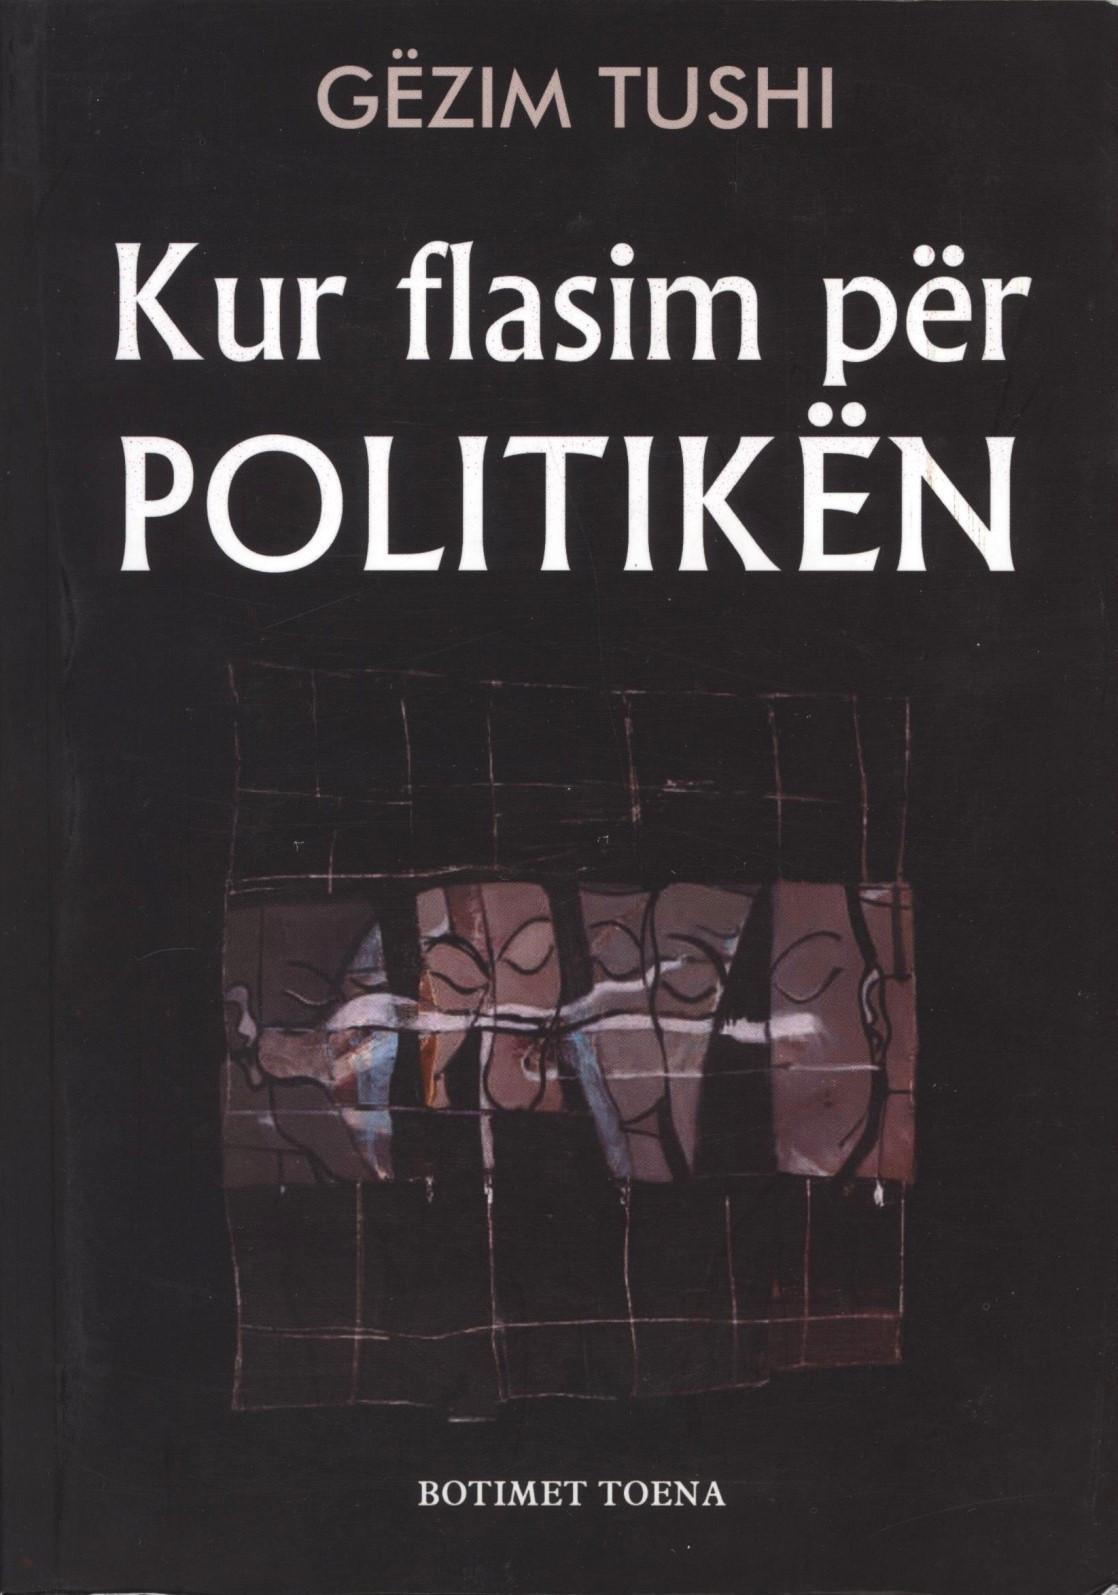 Kur flasim per politiken